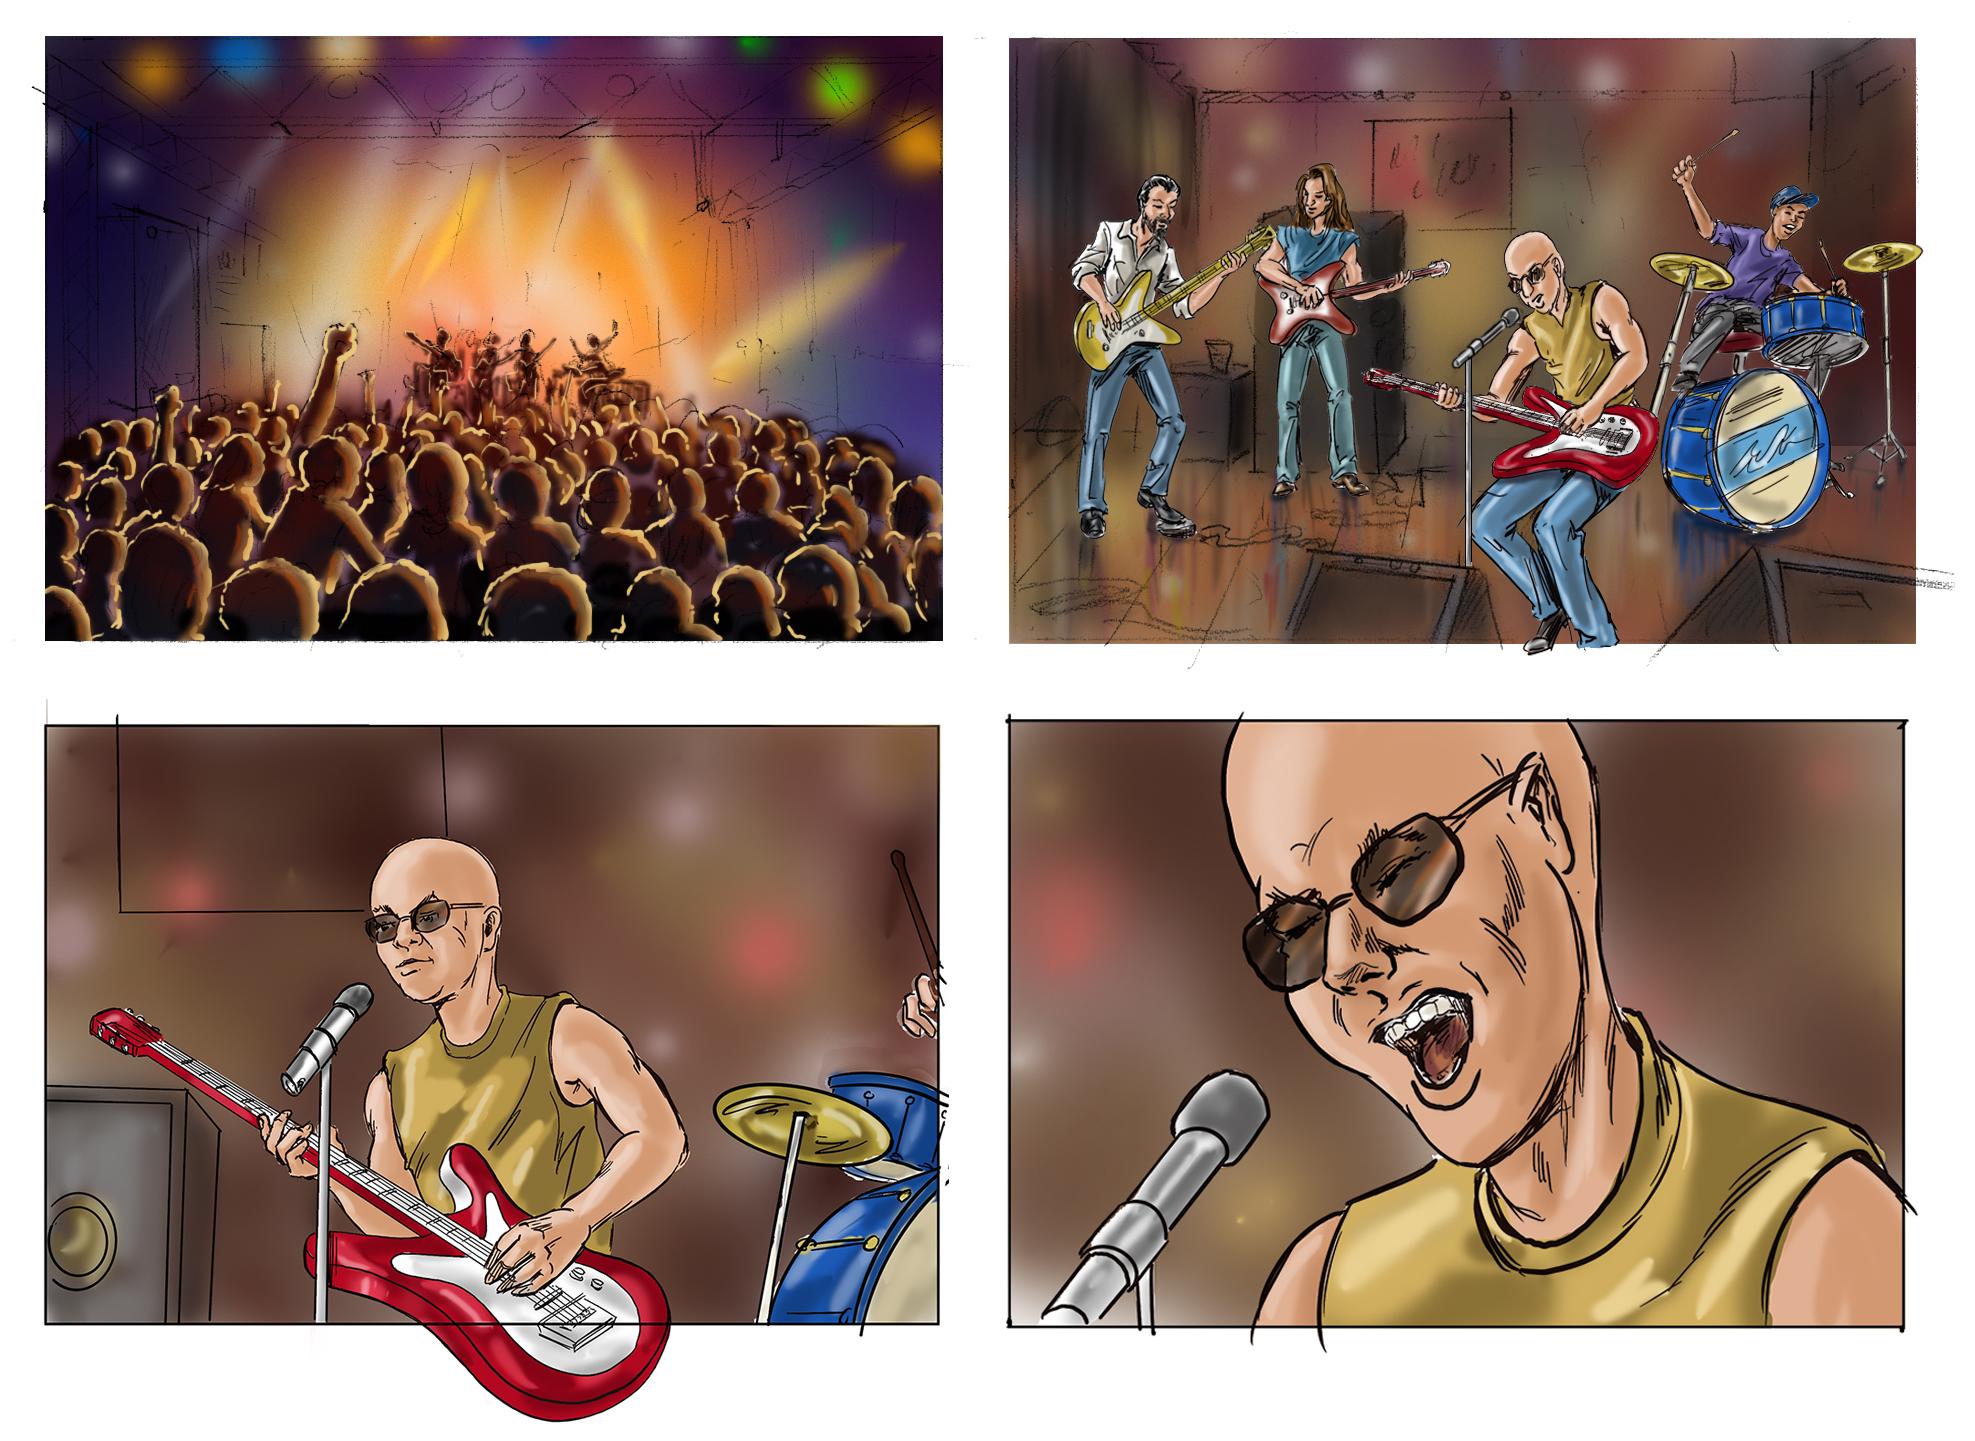 rcok_guitar_Final_frames_1_4_.jpg